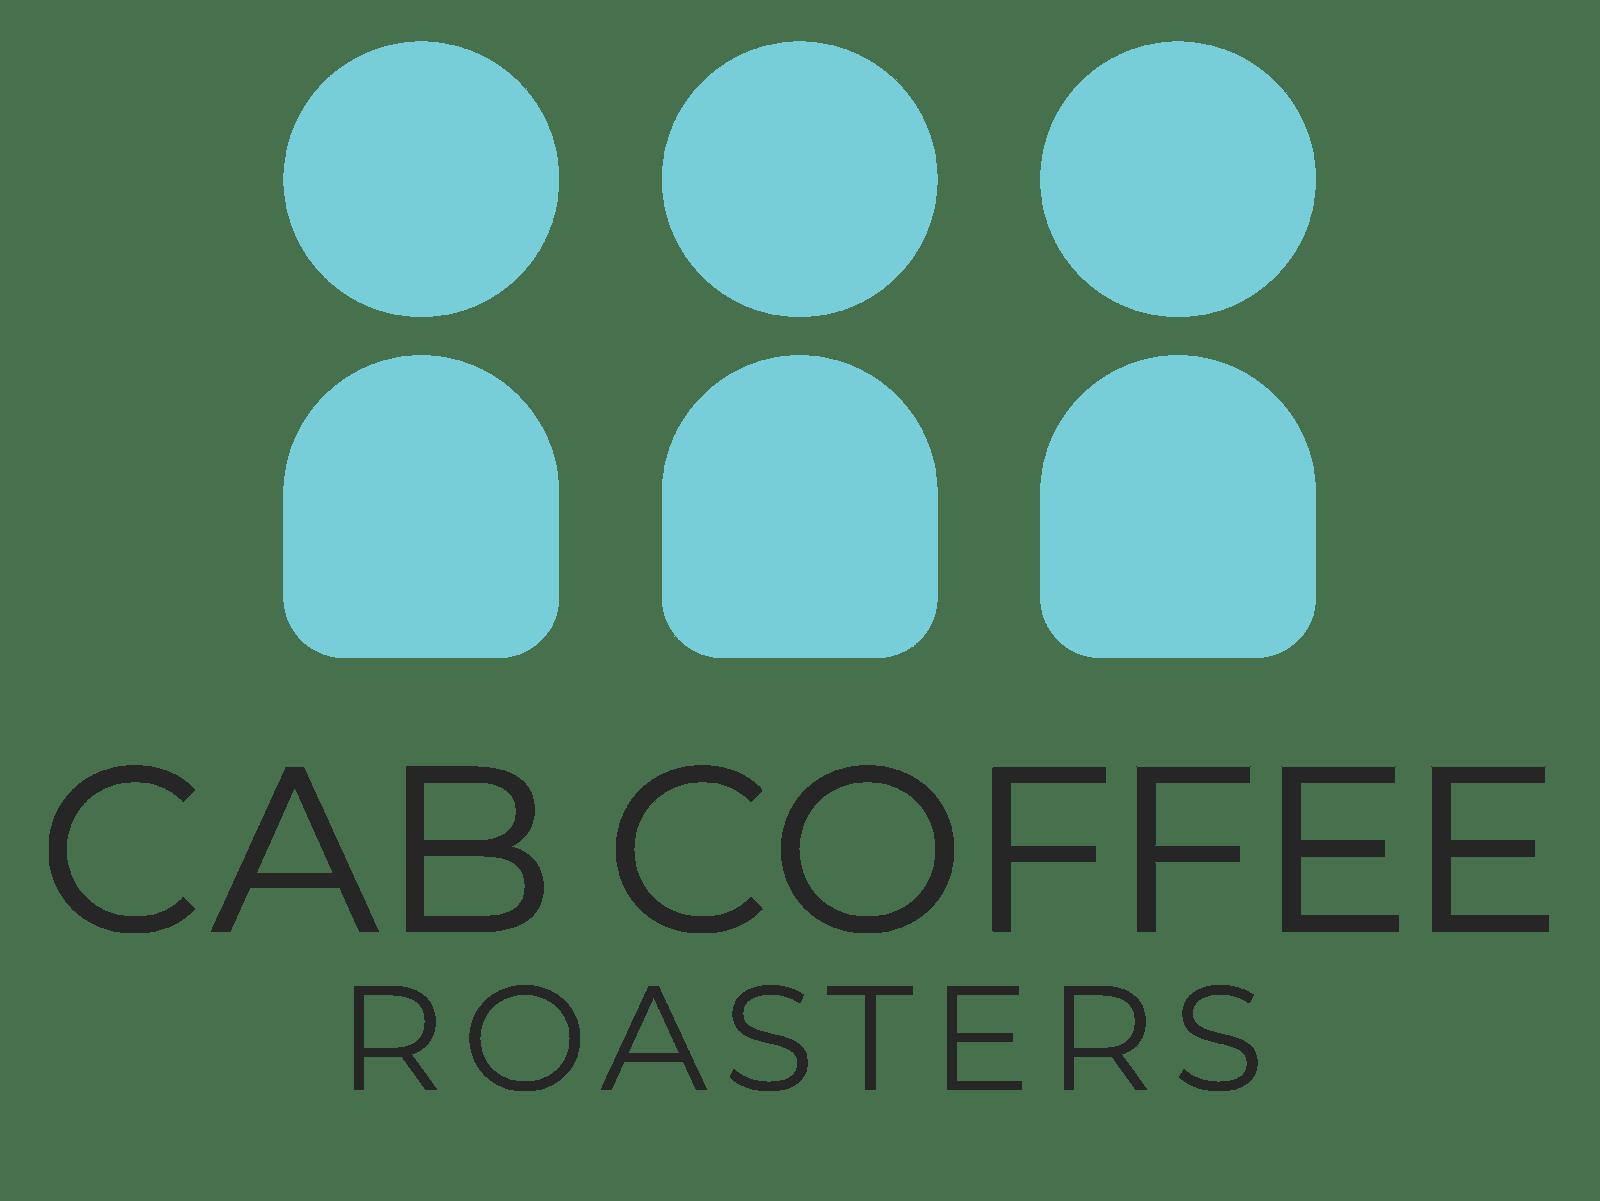 cab coffee roasters's account image